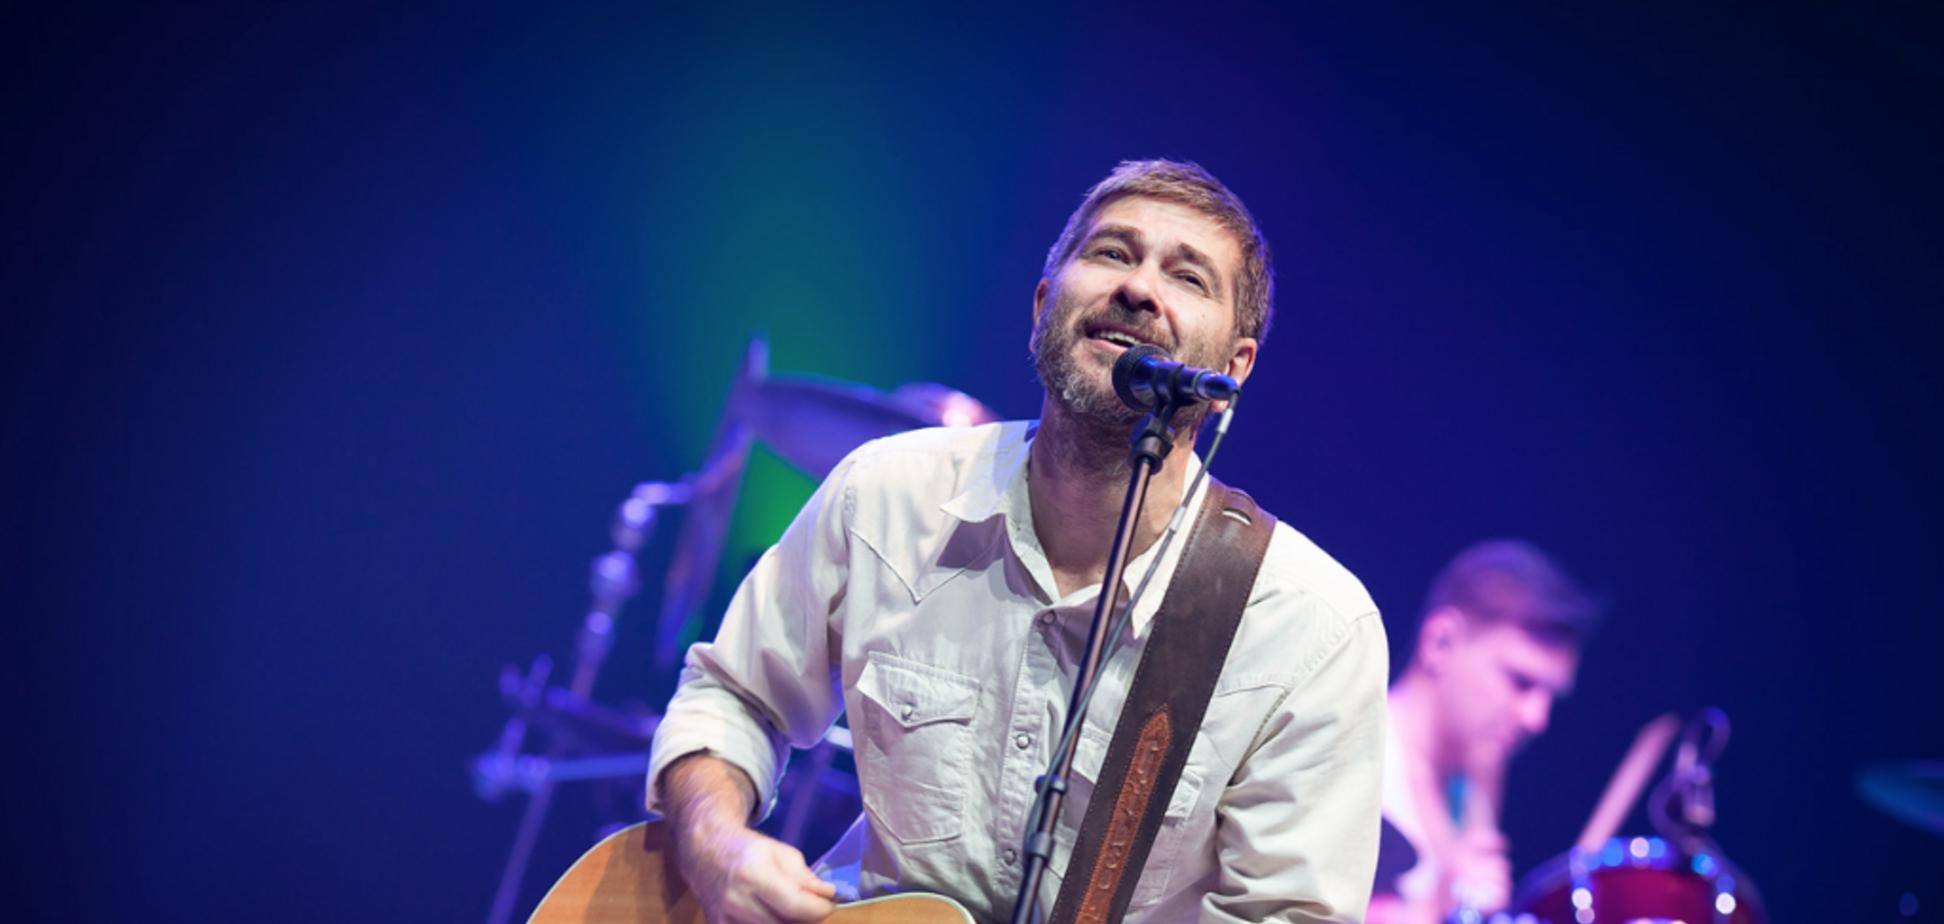 Александр Васильев, фронтмен группы 'Сплин'